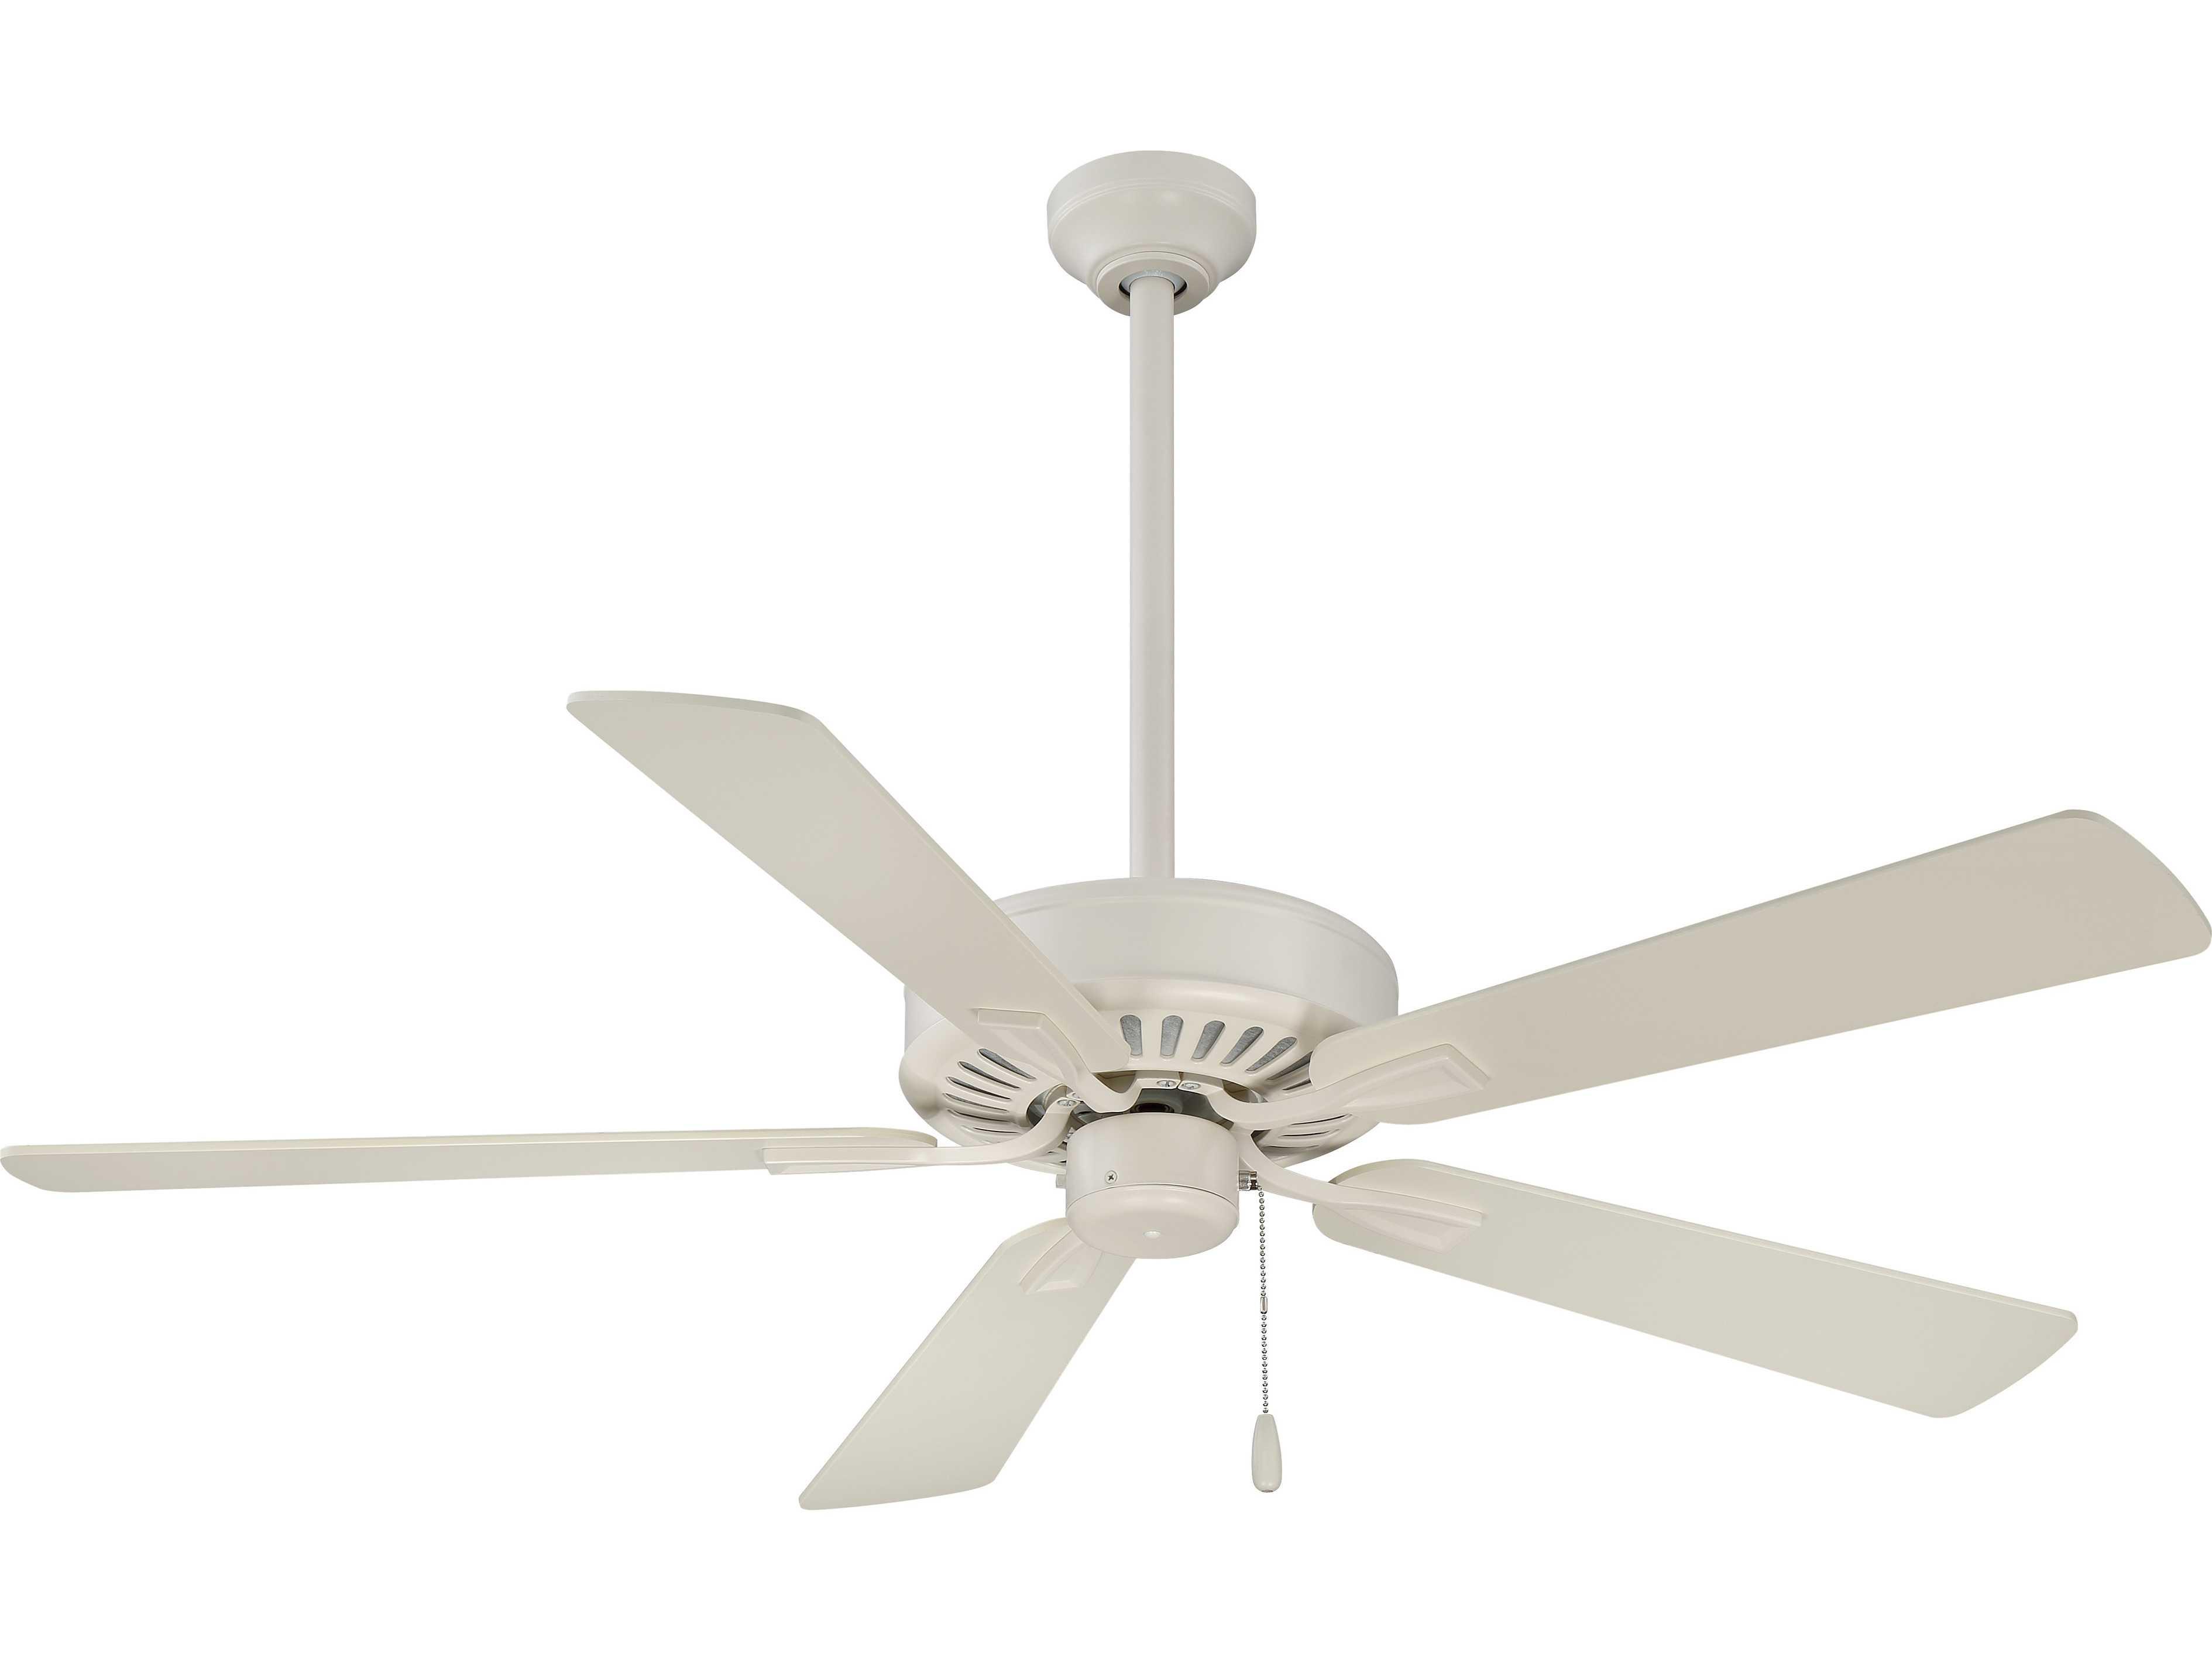 Minka Aire Contractor Plus Bone White 52 Wide Indoor Ceiling Fan